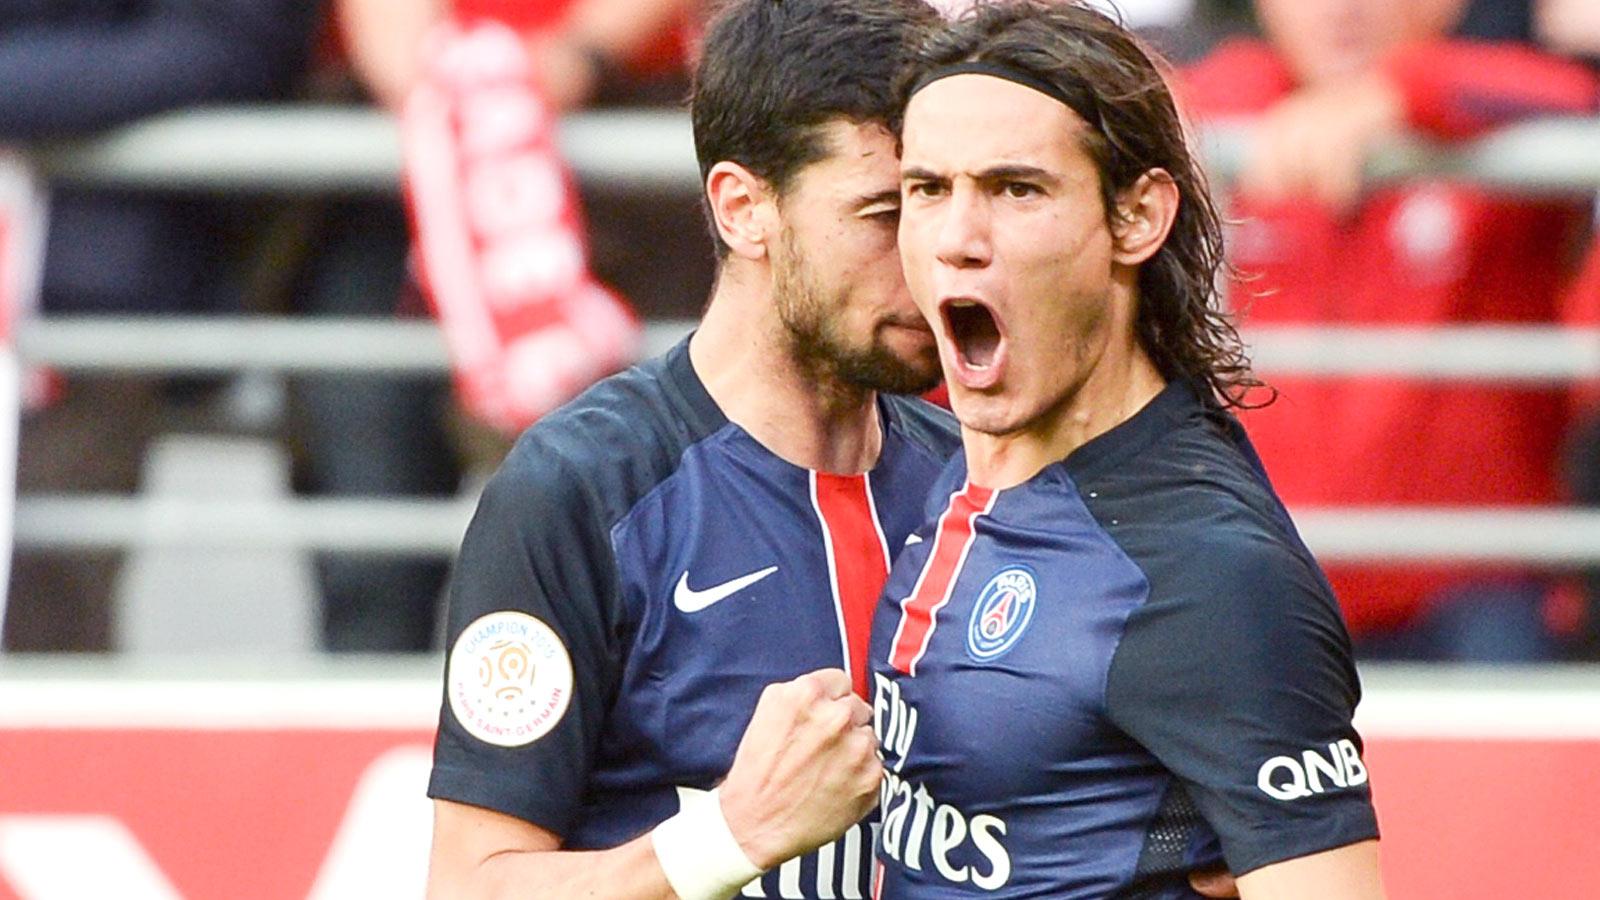 Paris Saint-Germain salvage draw at Reims with goal from Edinson Cavani